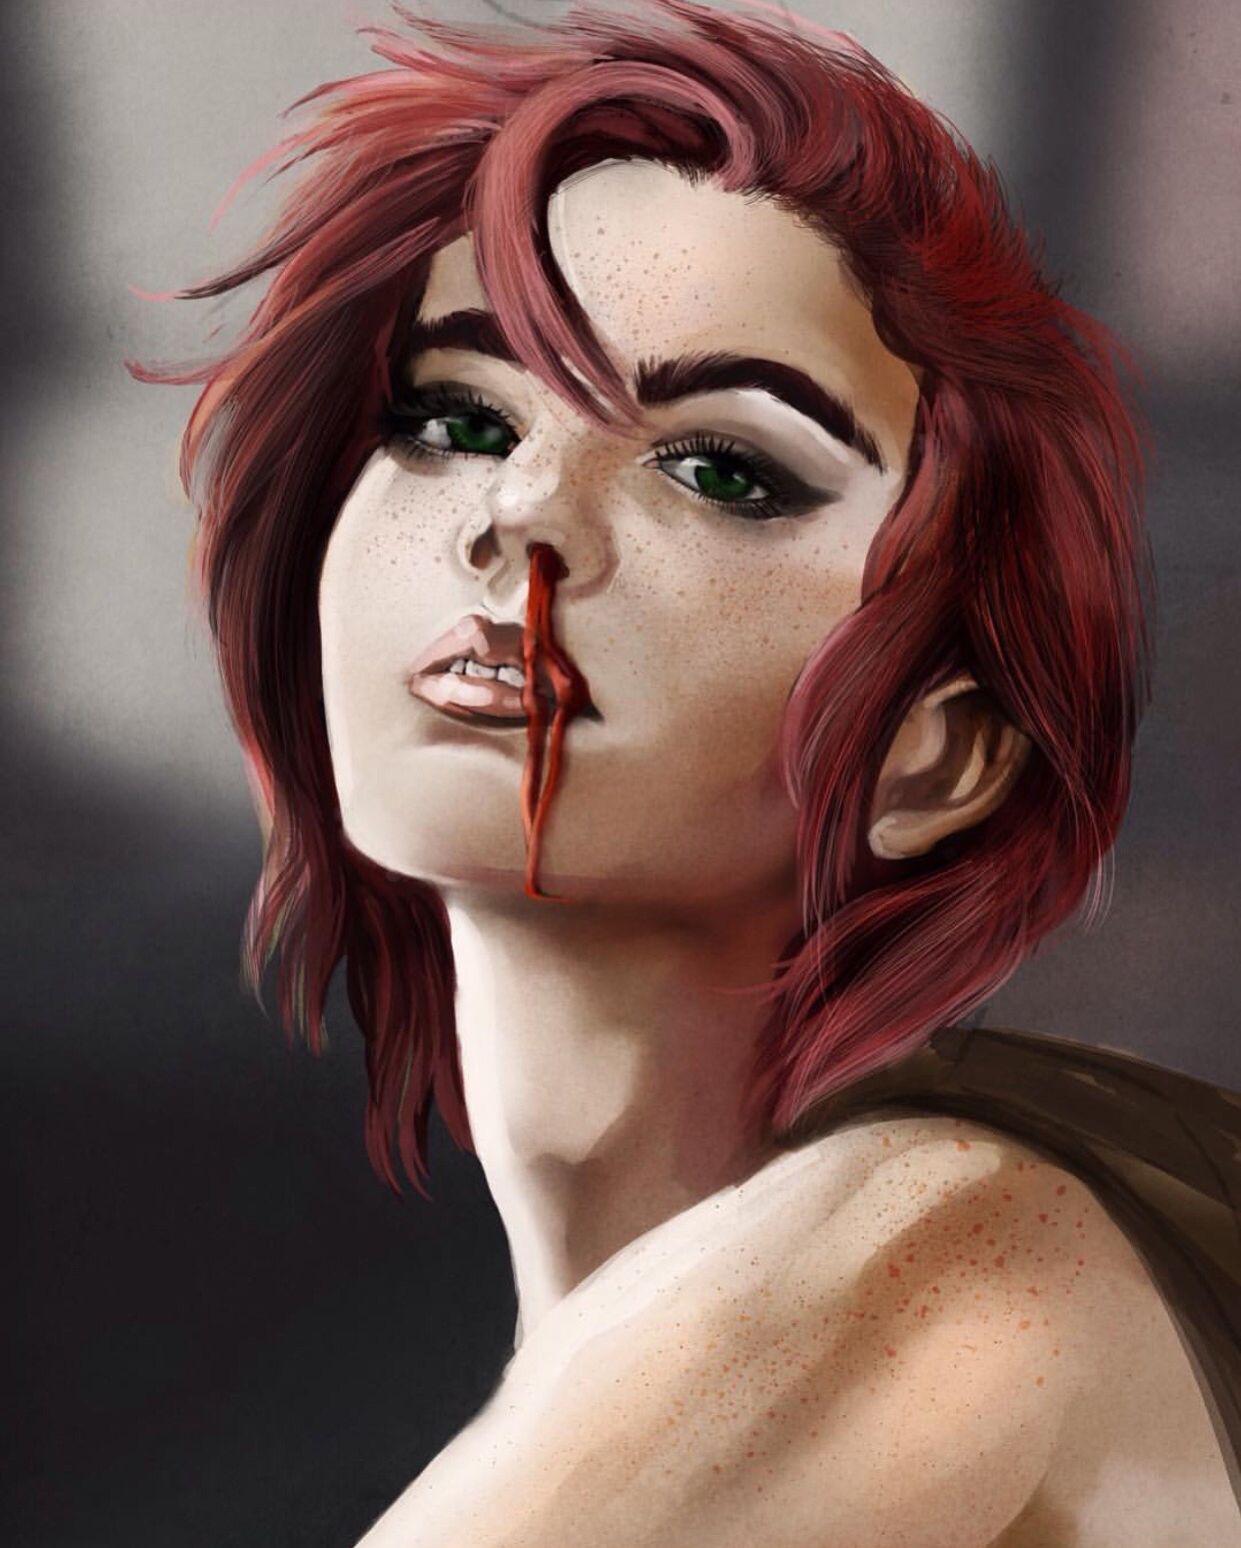 Artist: Amber // amberbrantleyart.tumblr.com